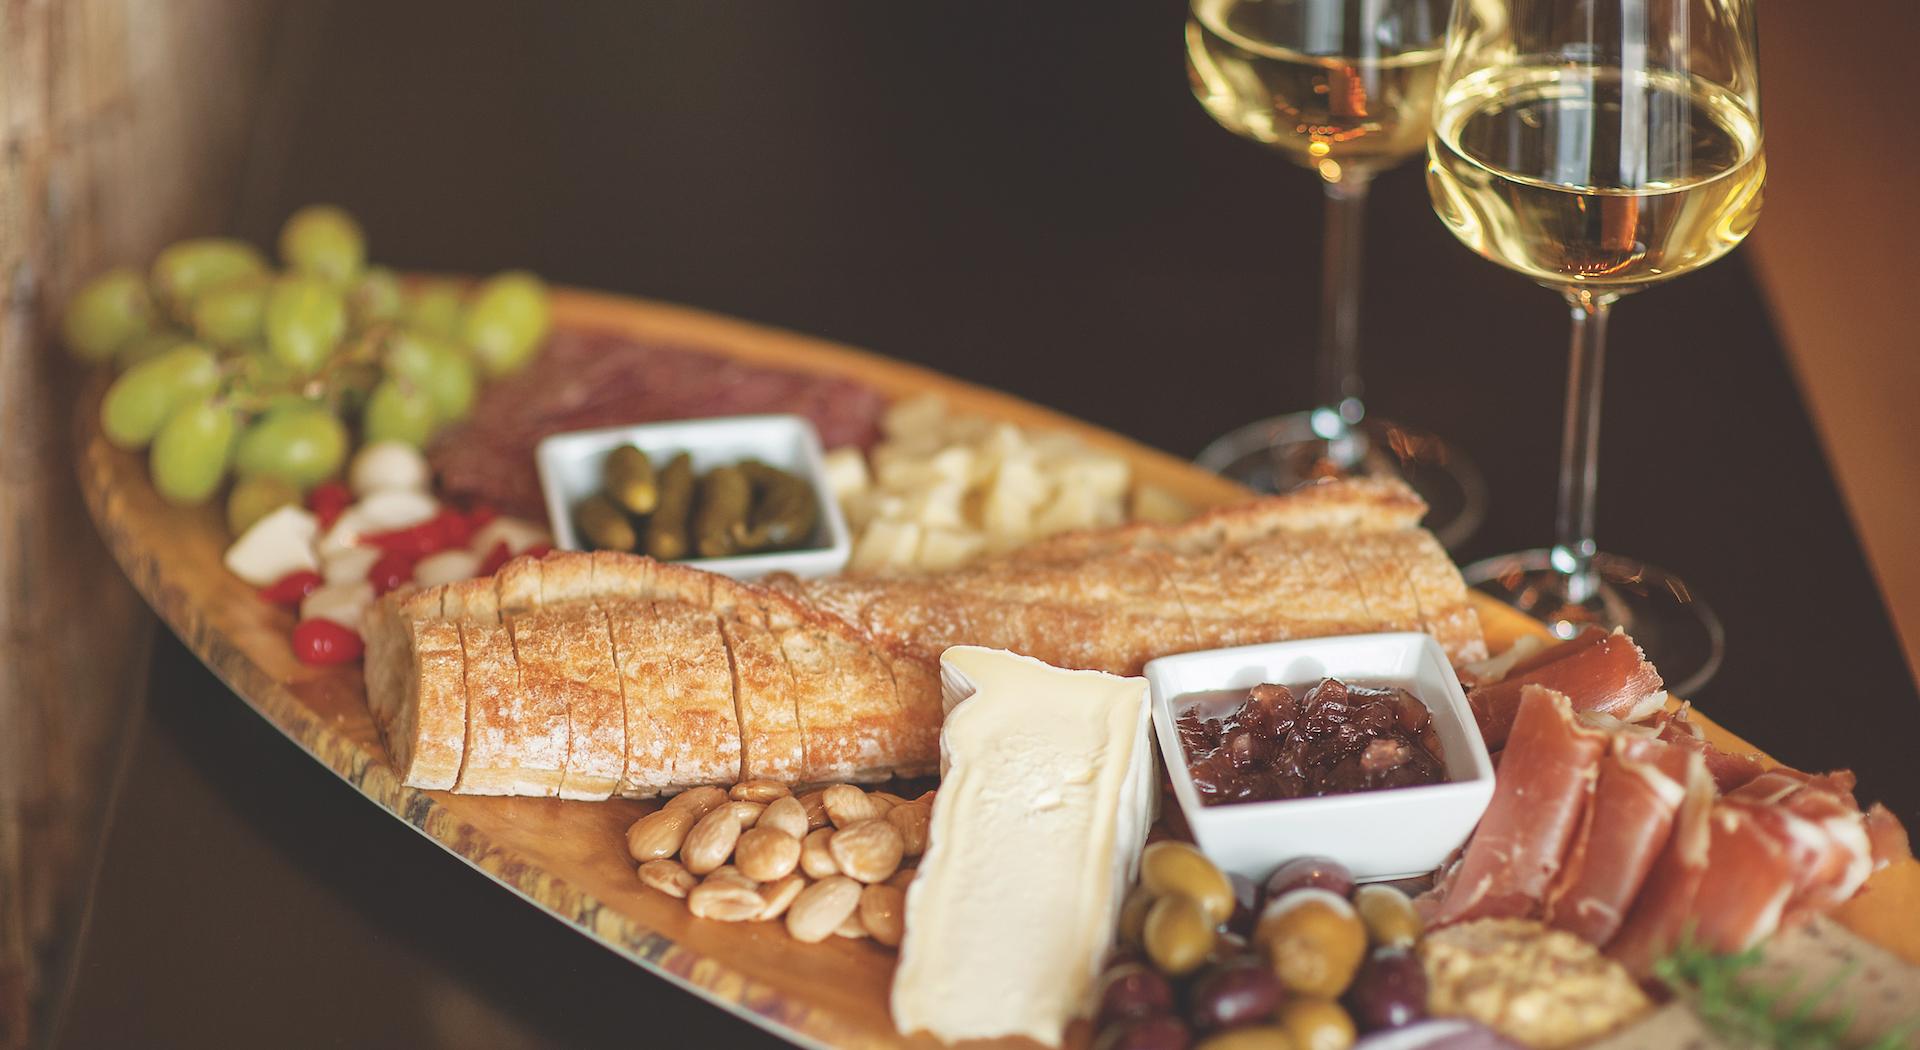 Northern Michigan wine bars